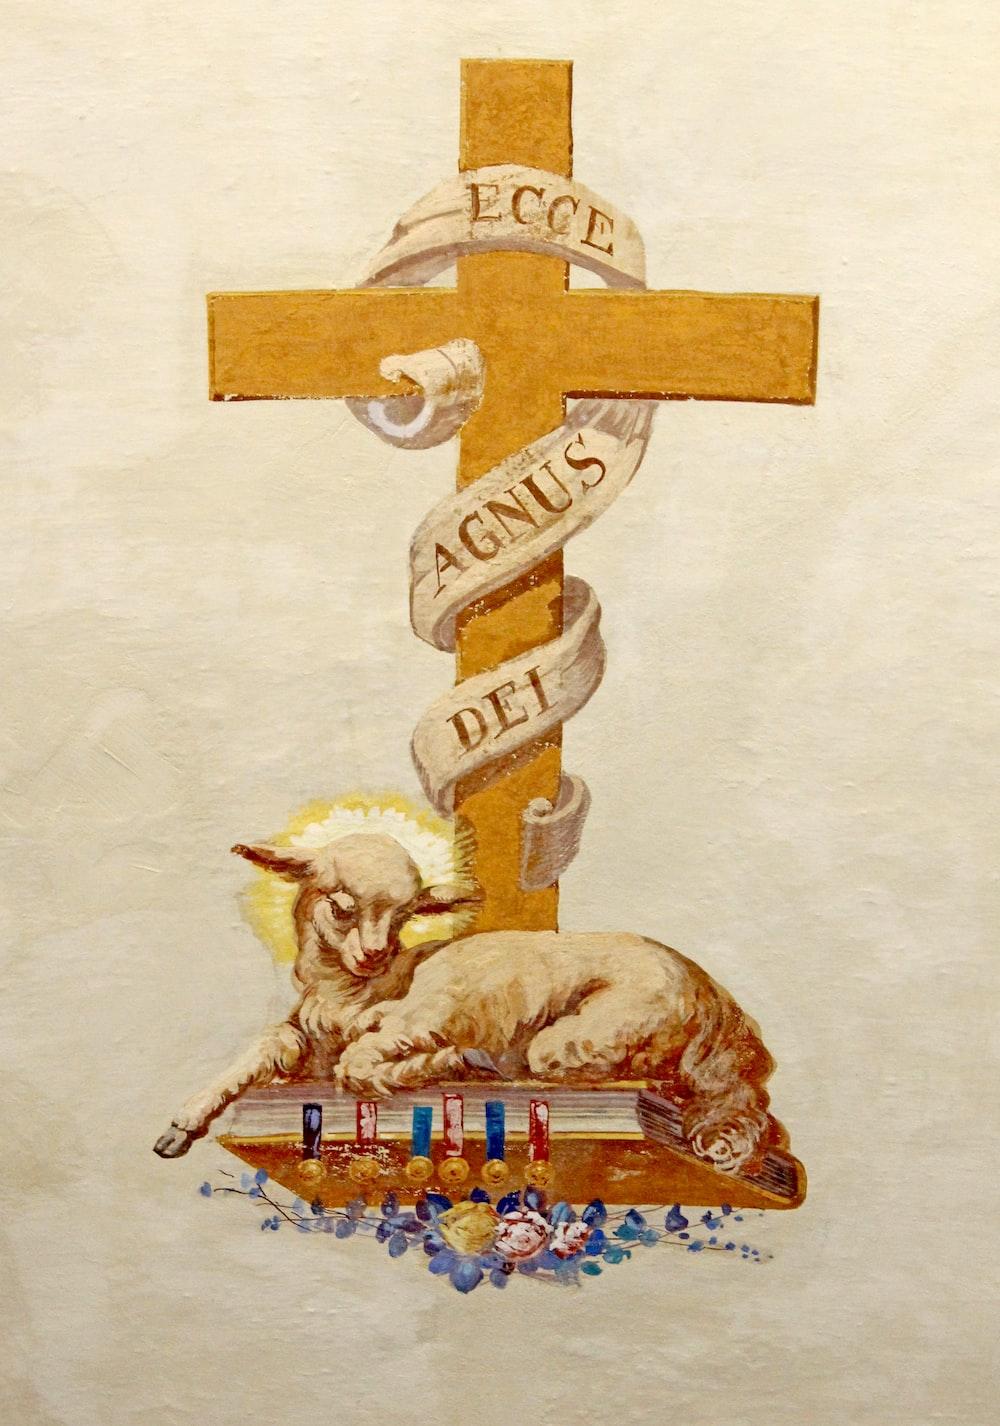 lamb on bible under cross illustration